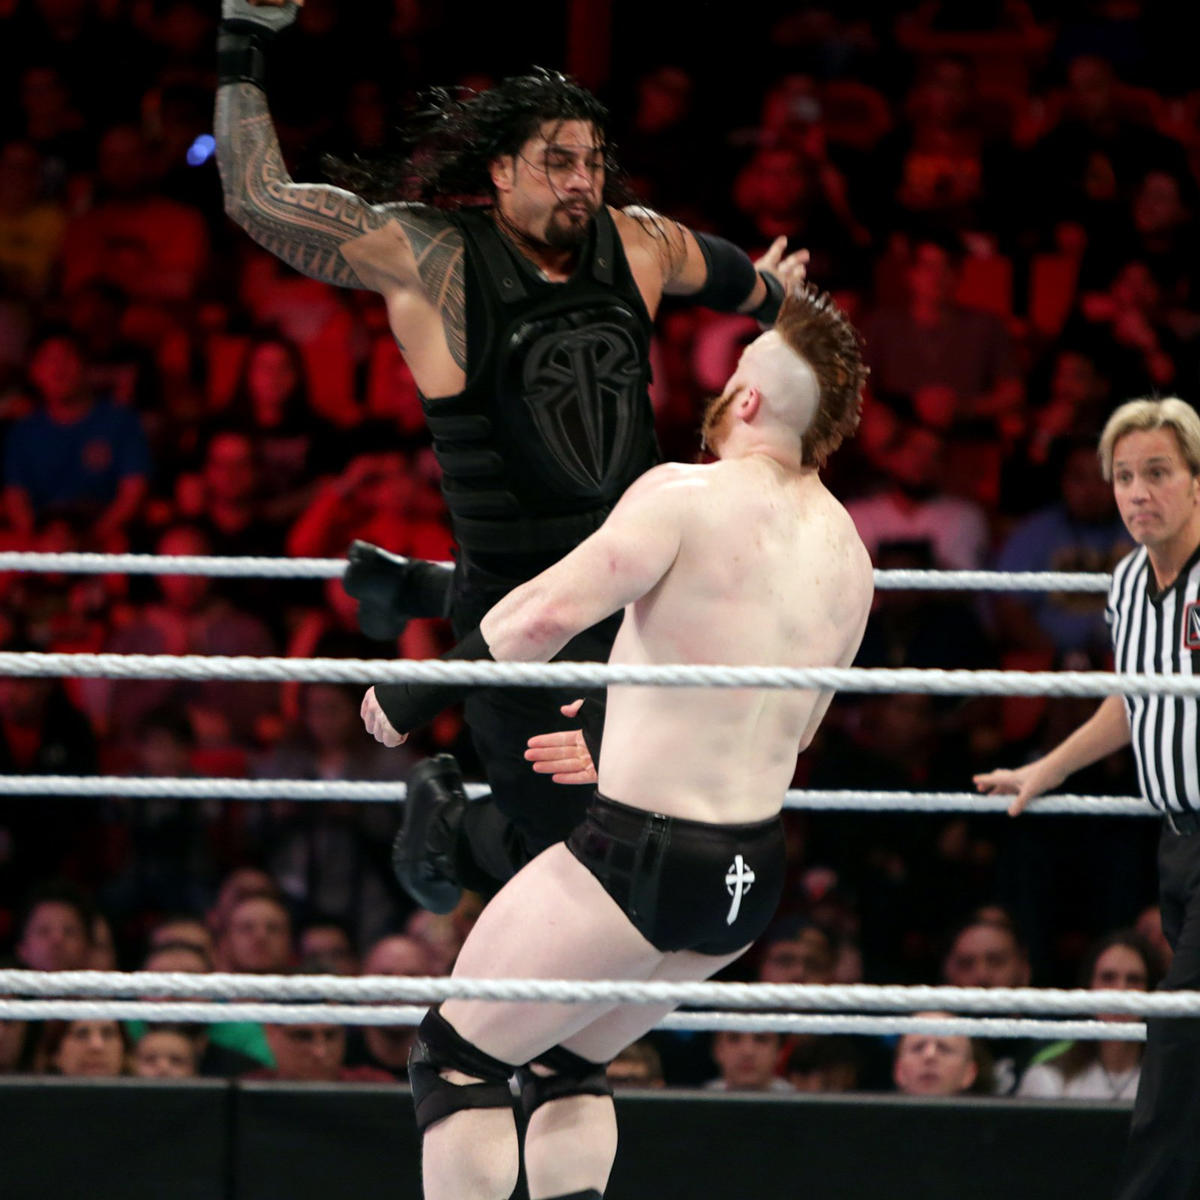 Roman Reigns Dean Ambrose Vs The League Of Nations Photos Wwe